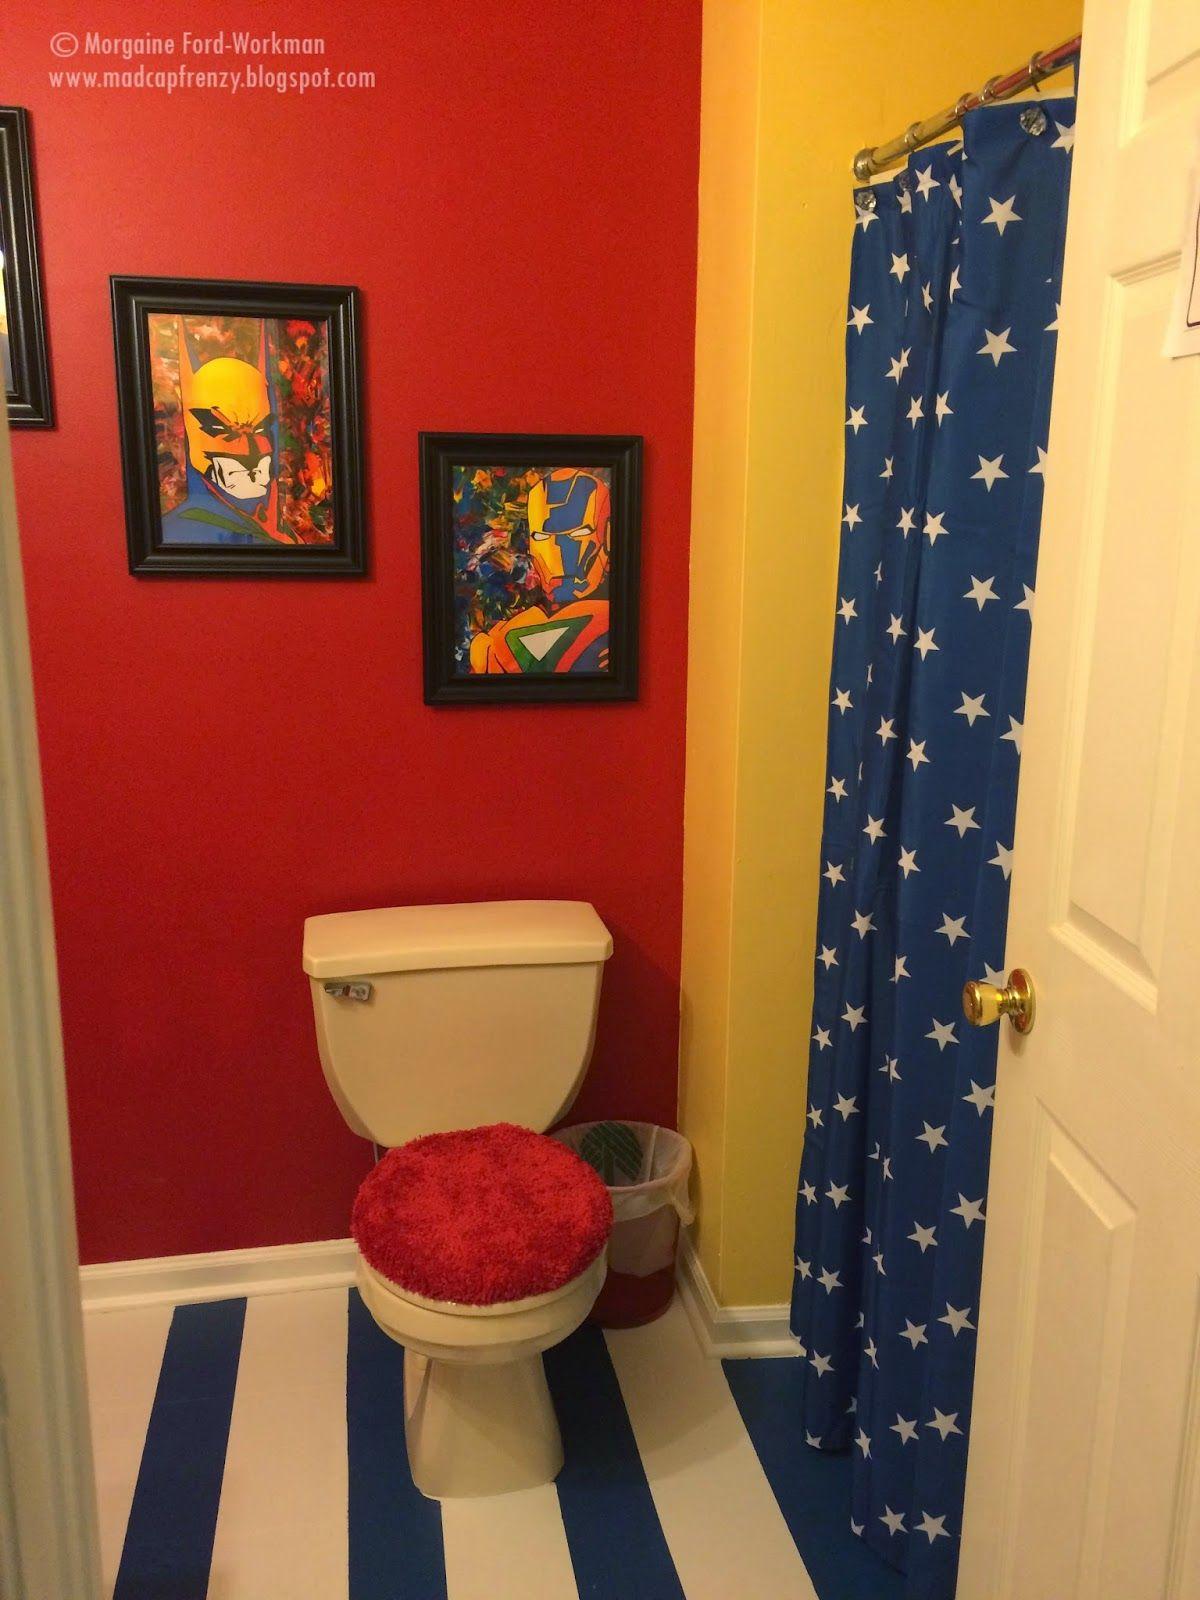 Marvel shower curtain - Bedrooms